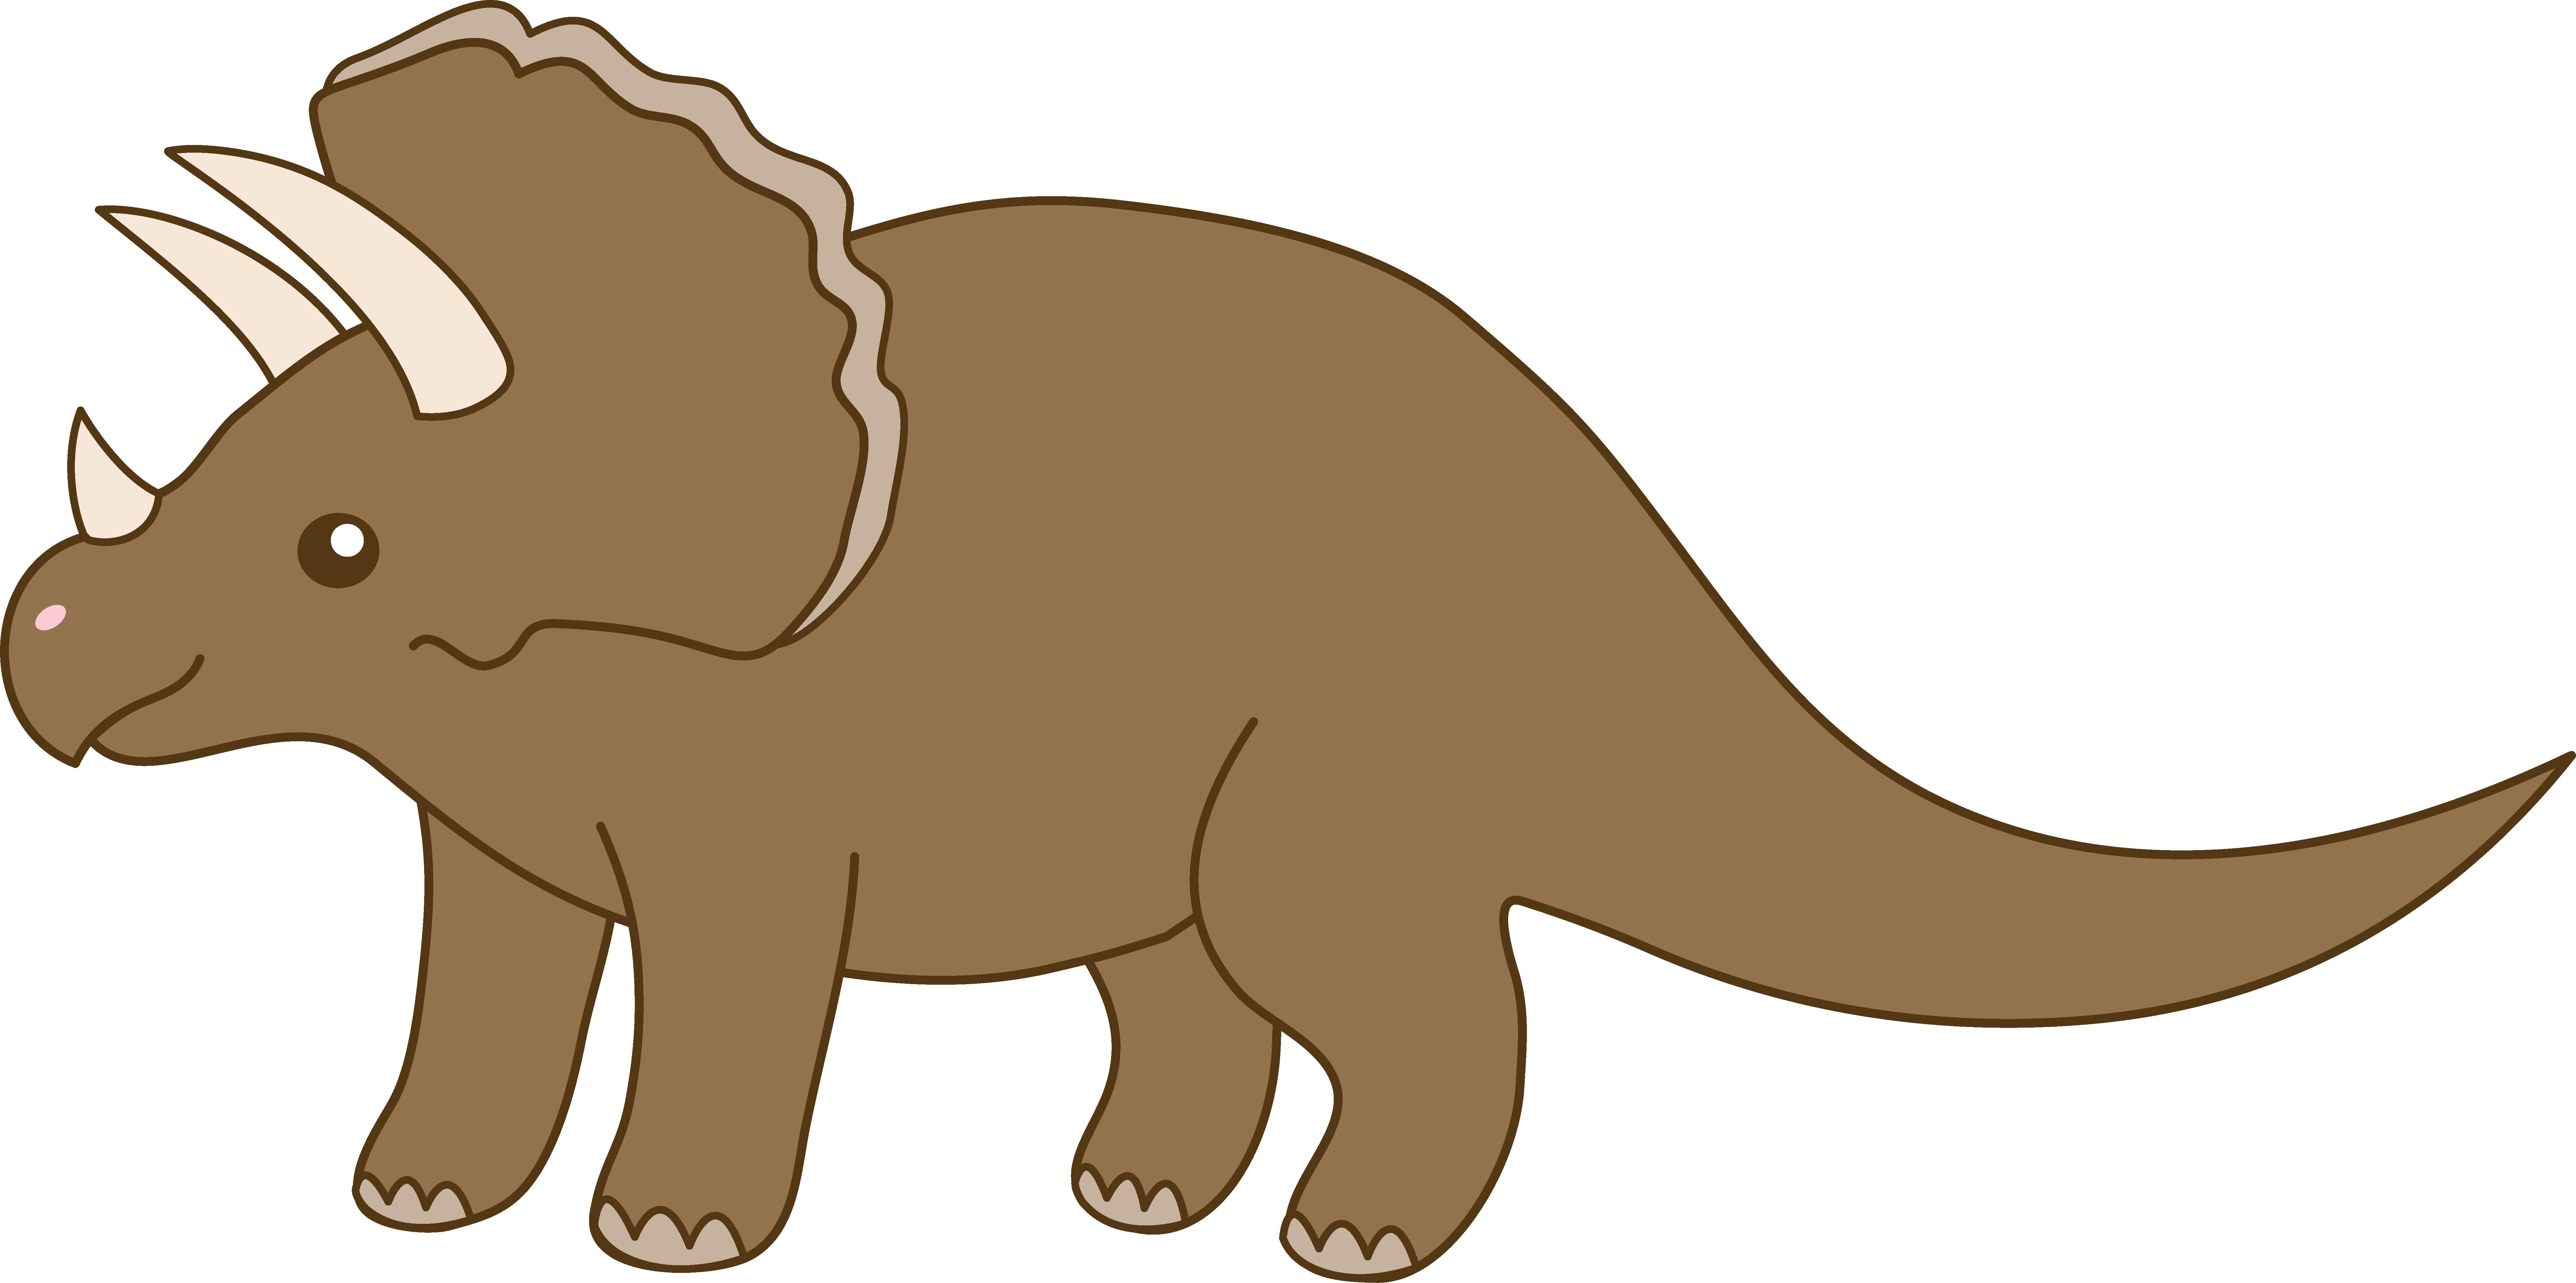 Dinosaurs clipart-Dinosaurs clipart-15